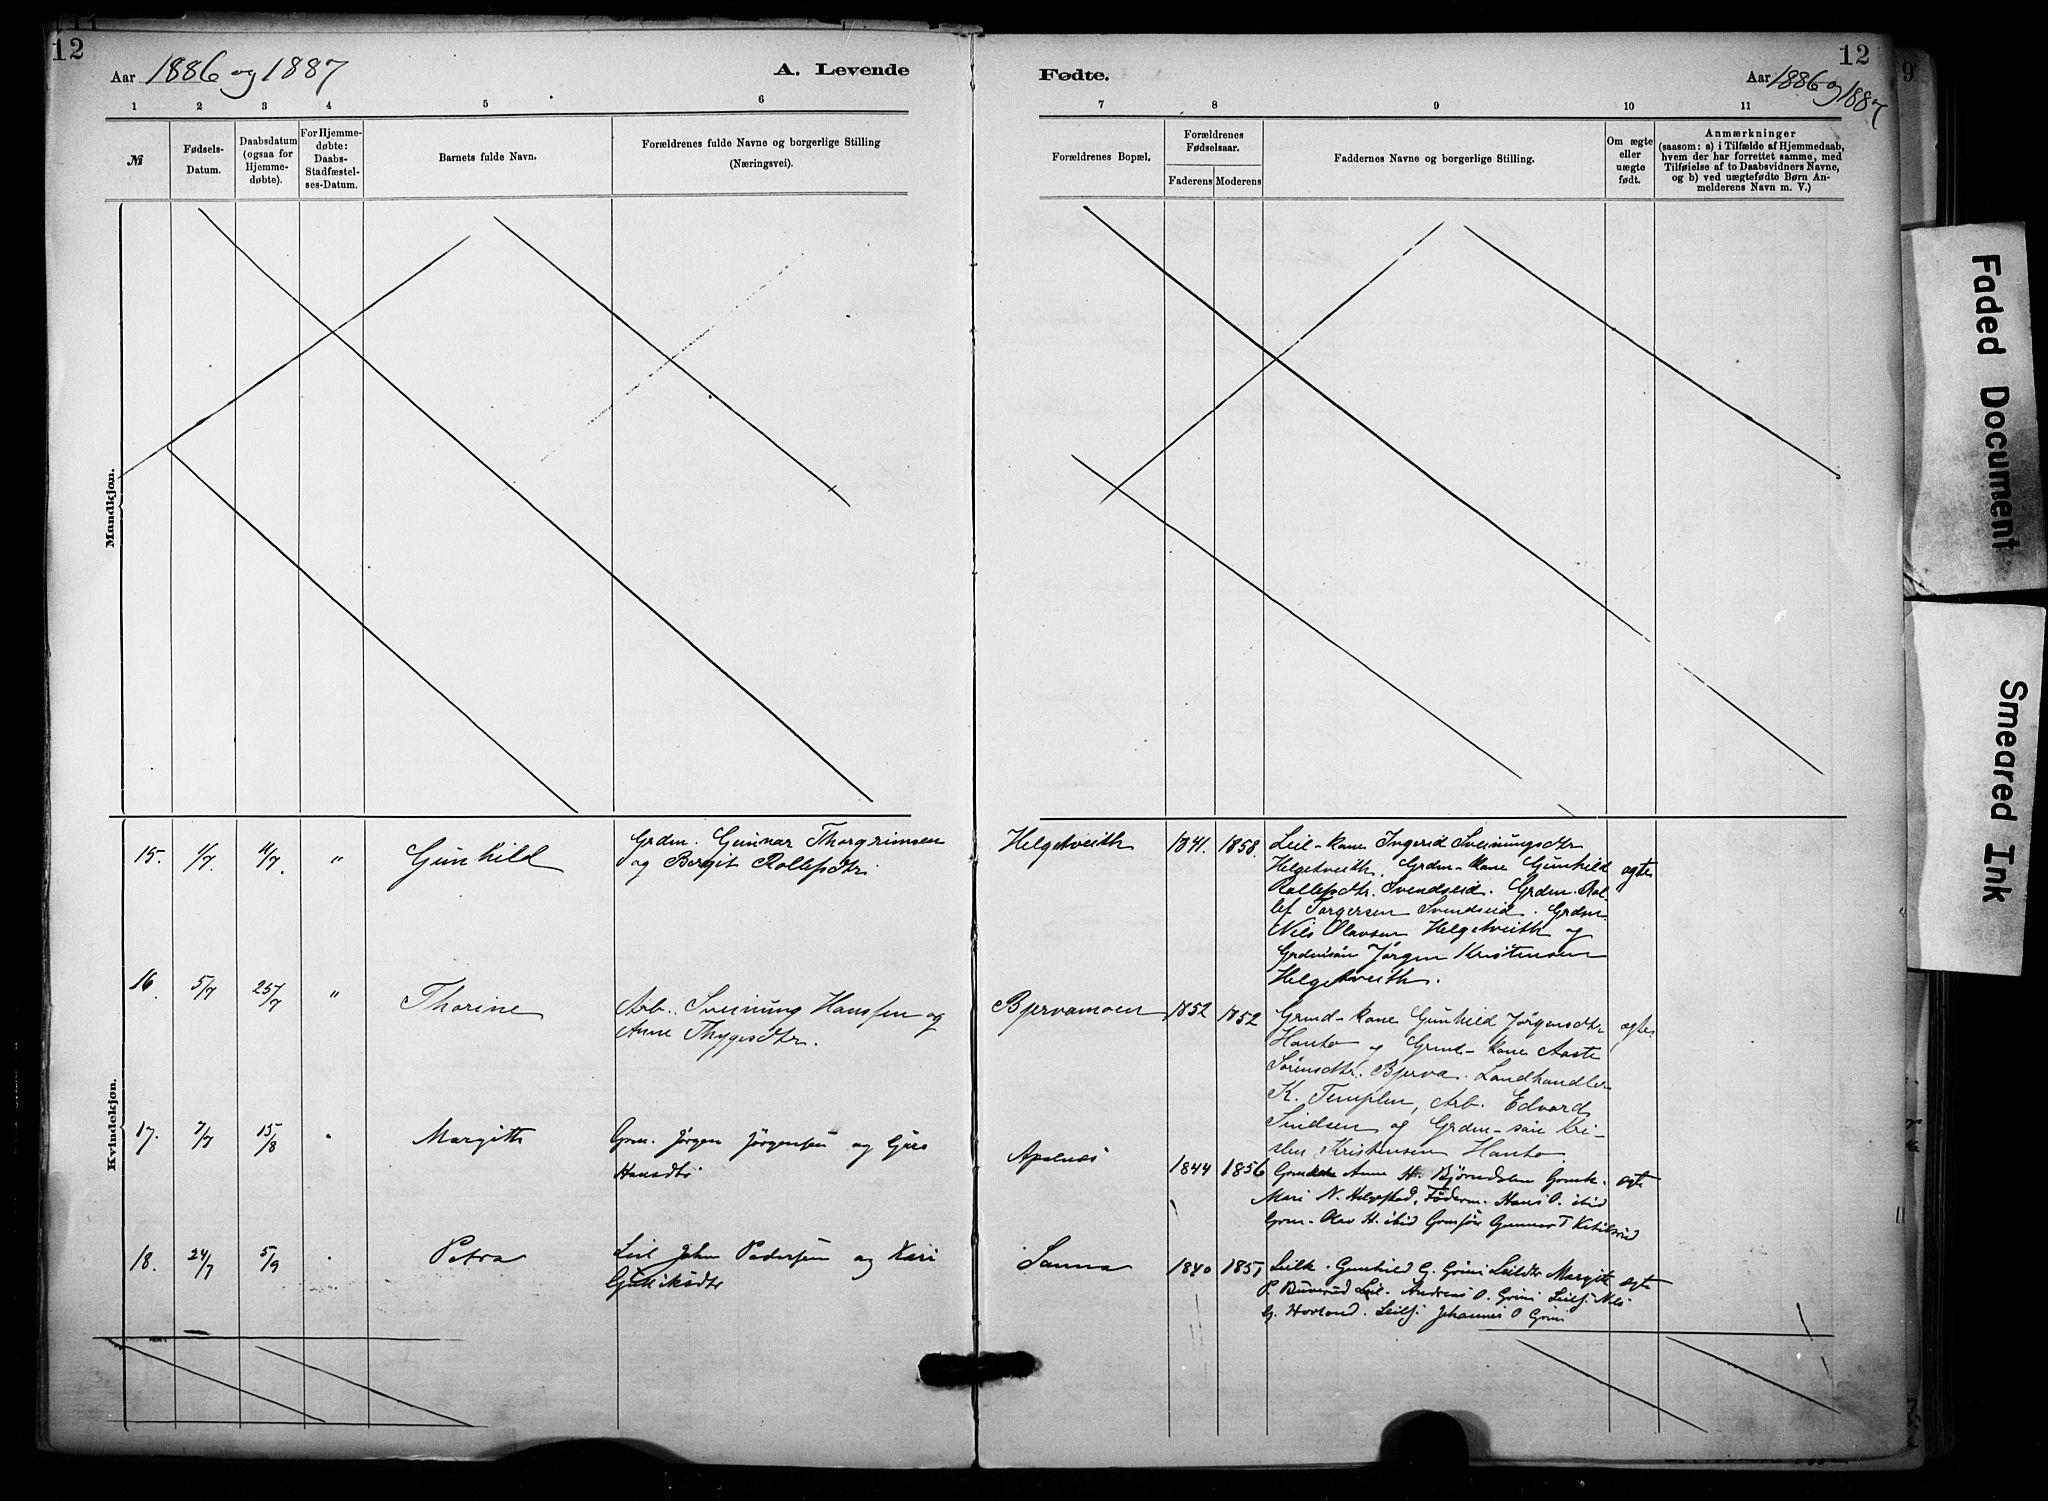 SAKO, Lunde kirkebøker, F/Fa/L0002: Parish register (official) no. I 2, 1884-1892, p. 12